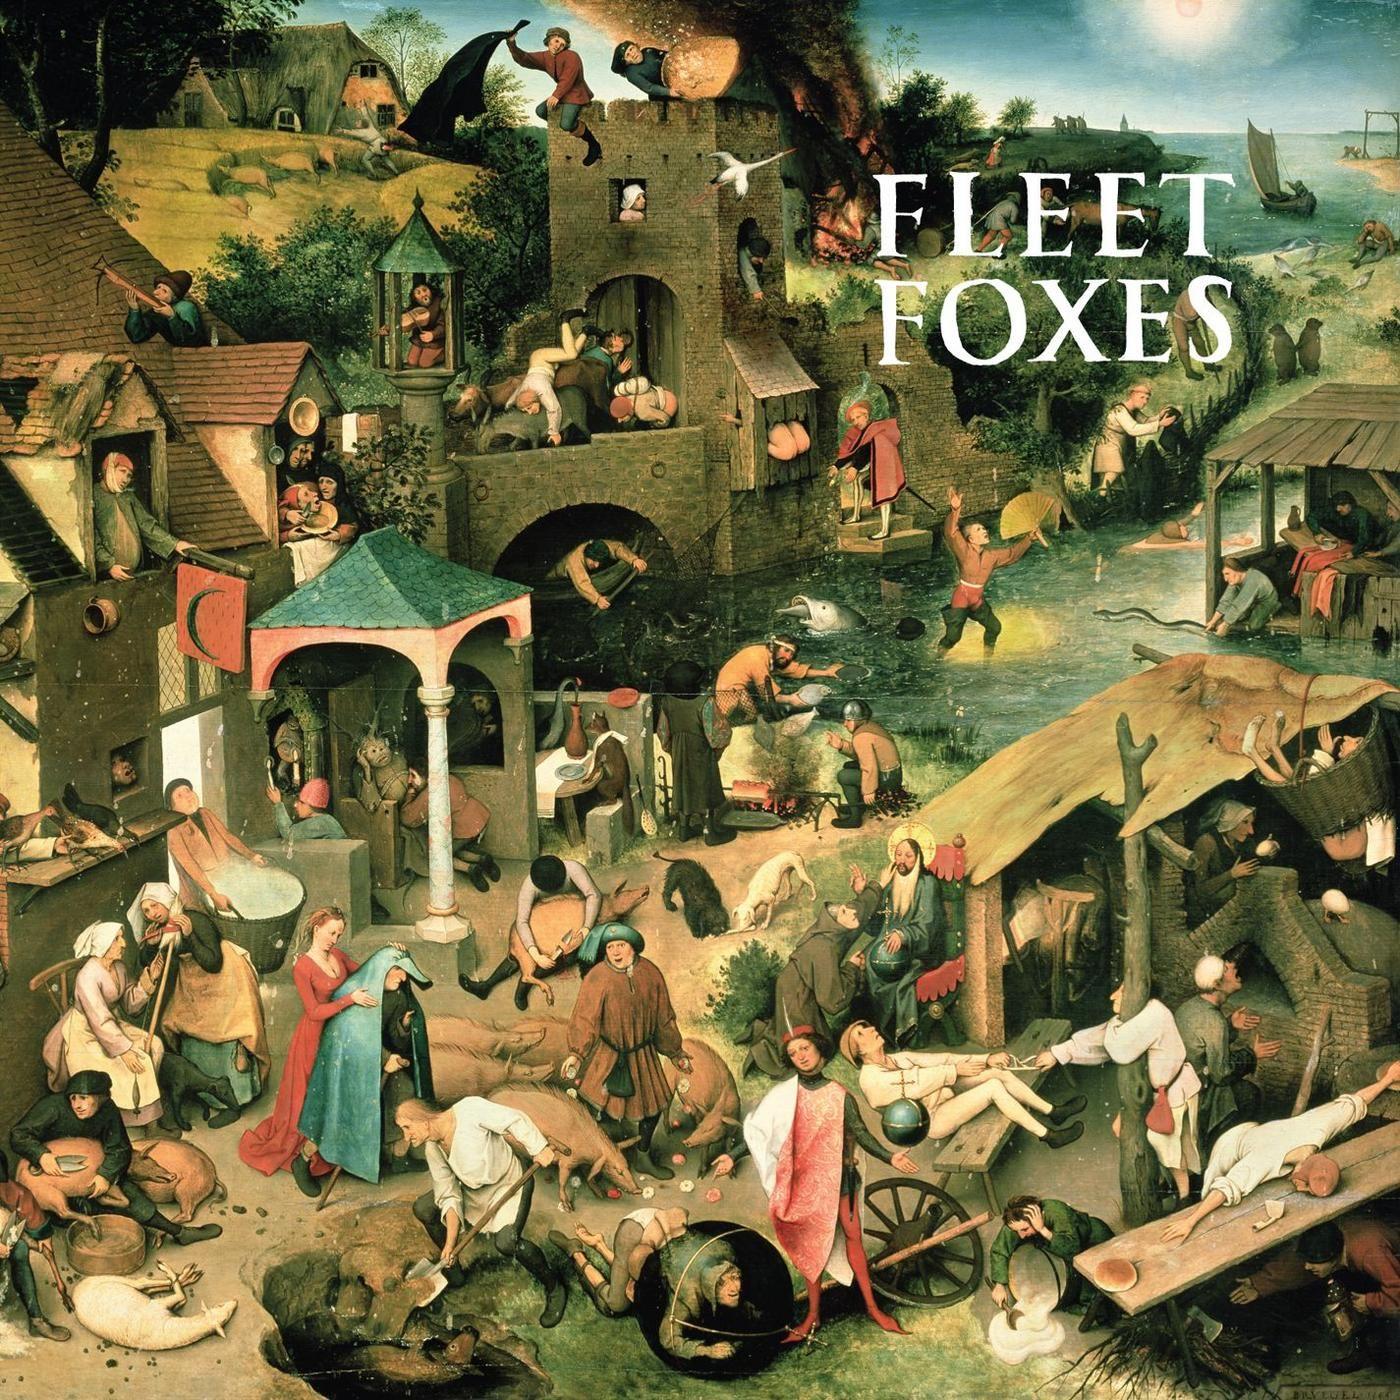 Fleet Foxes - Fleet Foxes album cover